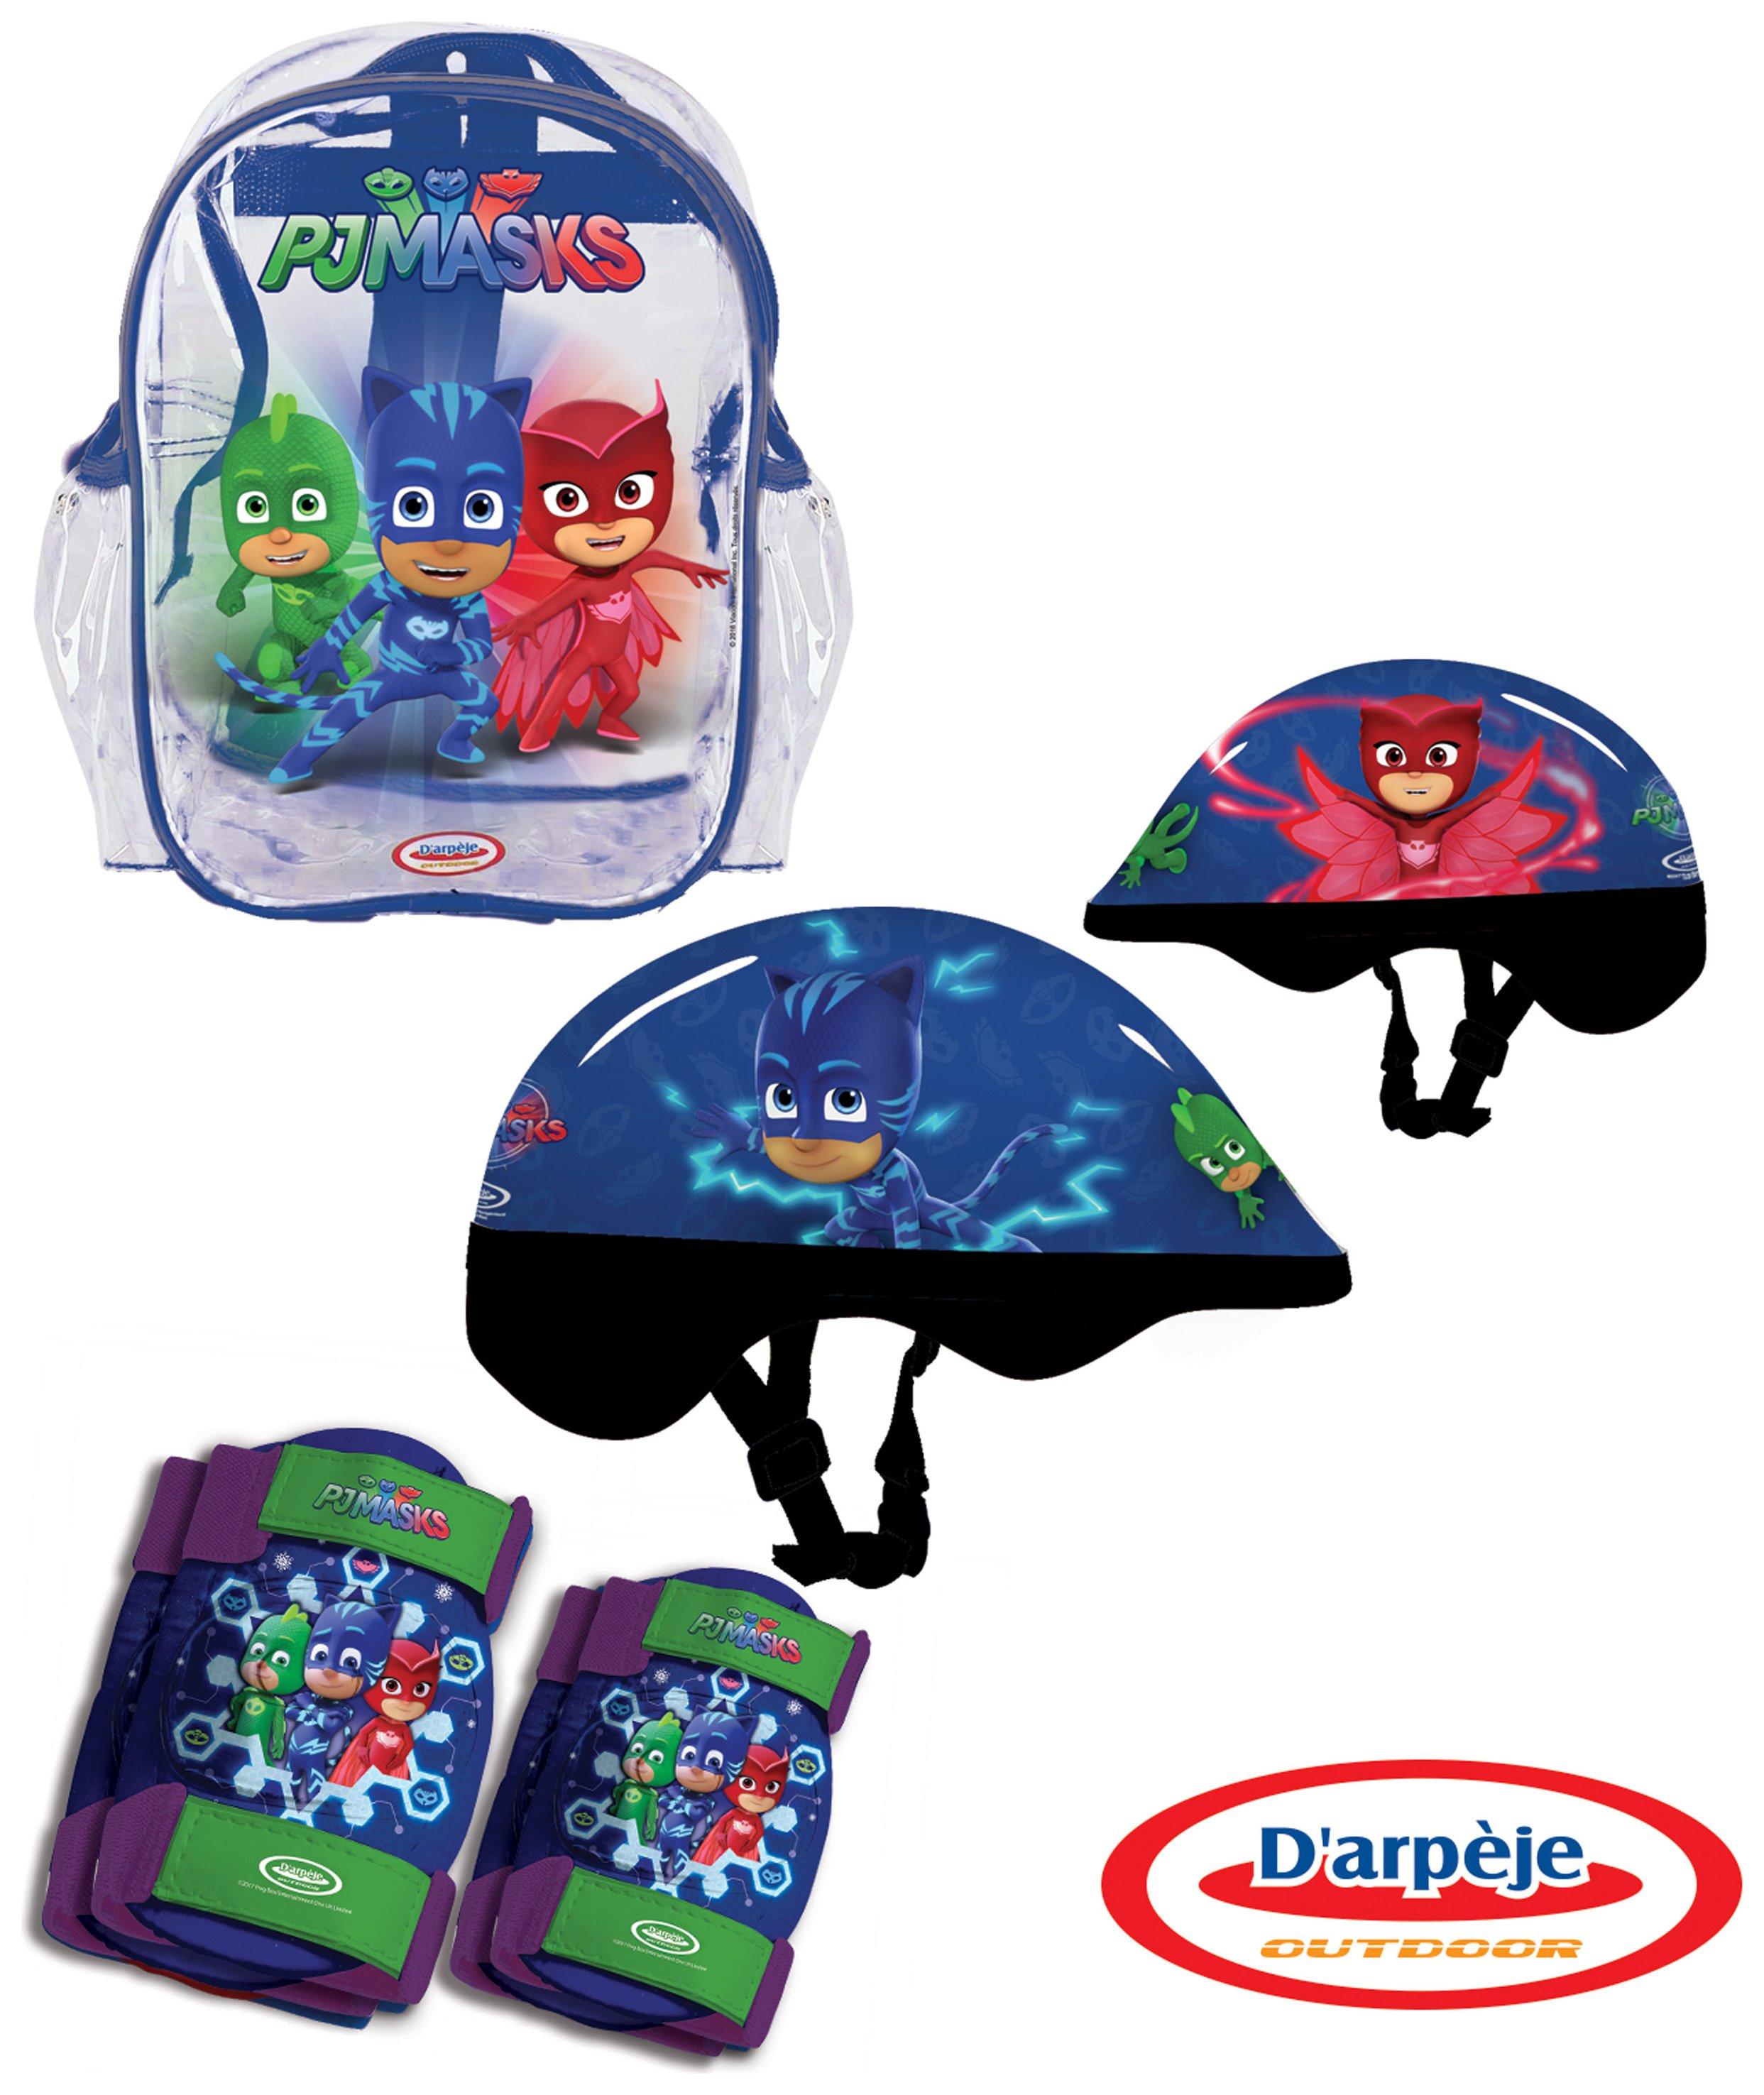 PJ Masks Safety Protection Set   Small